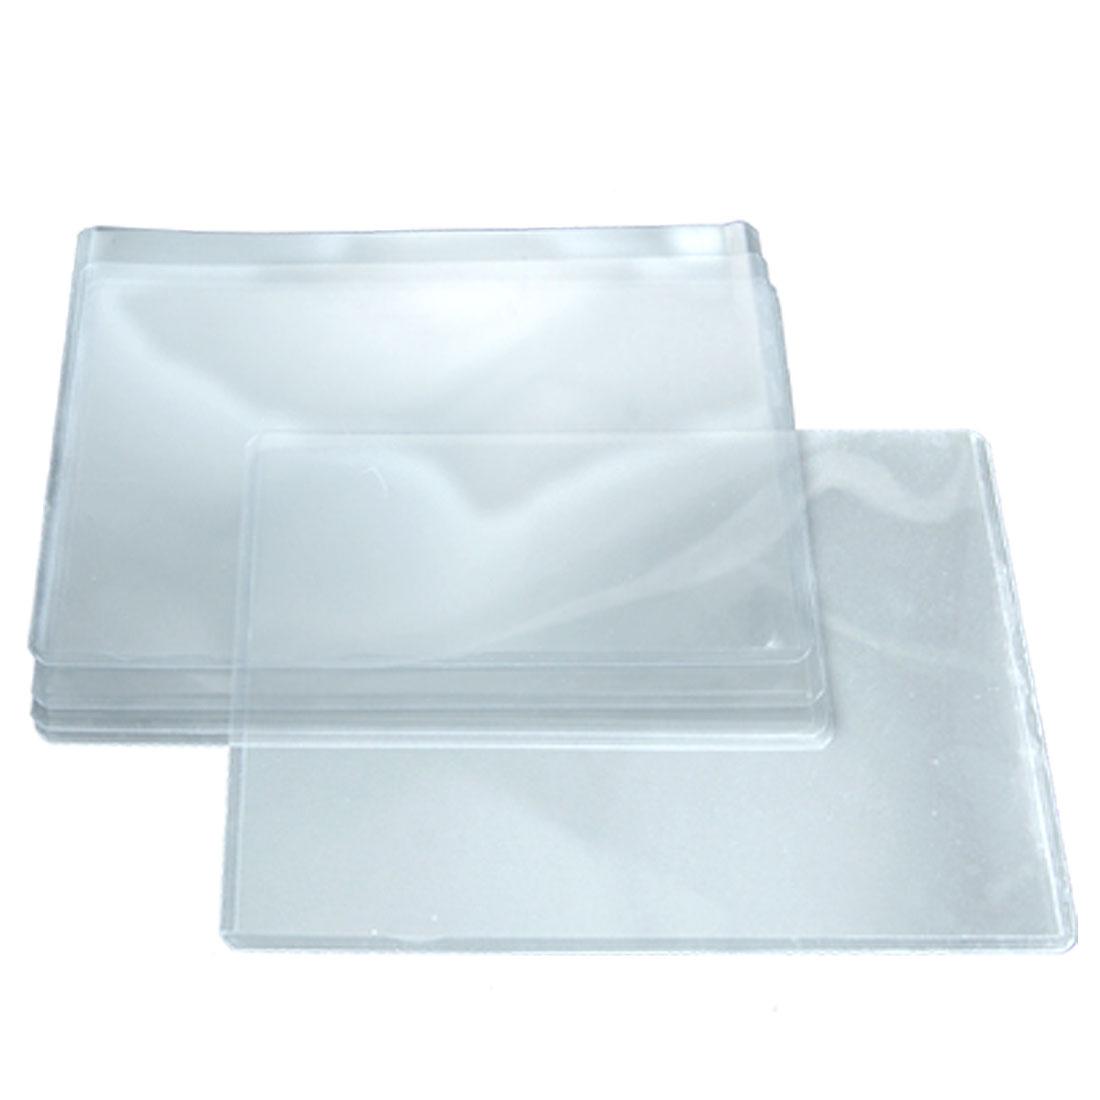 A5 Paper Files Cards Transparent Horizontal Holder 5Pcs